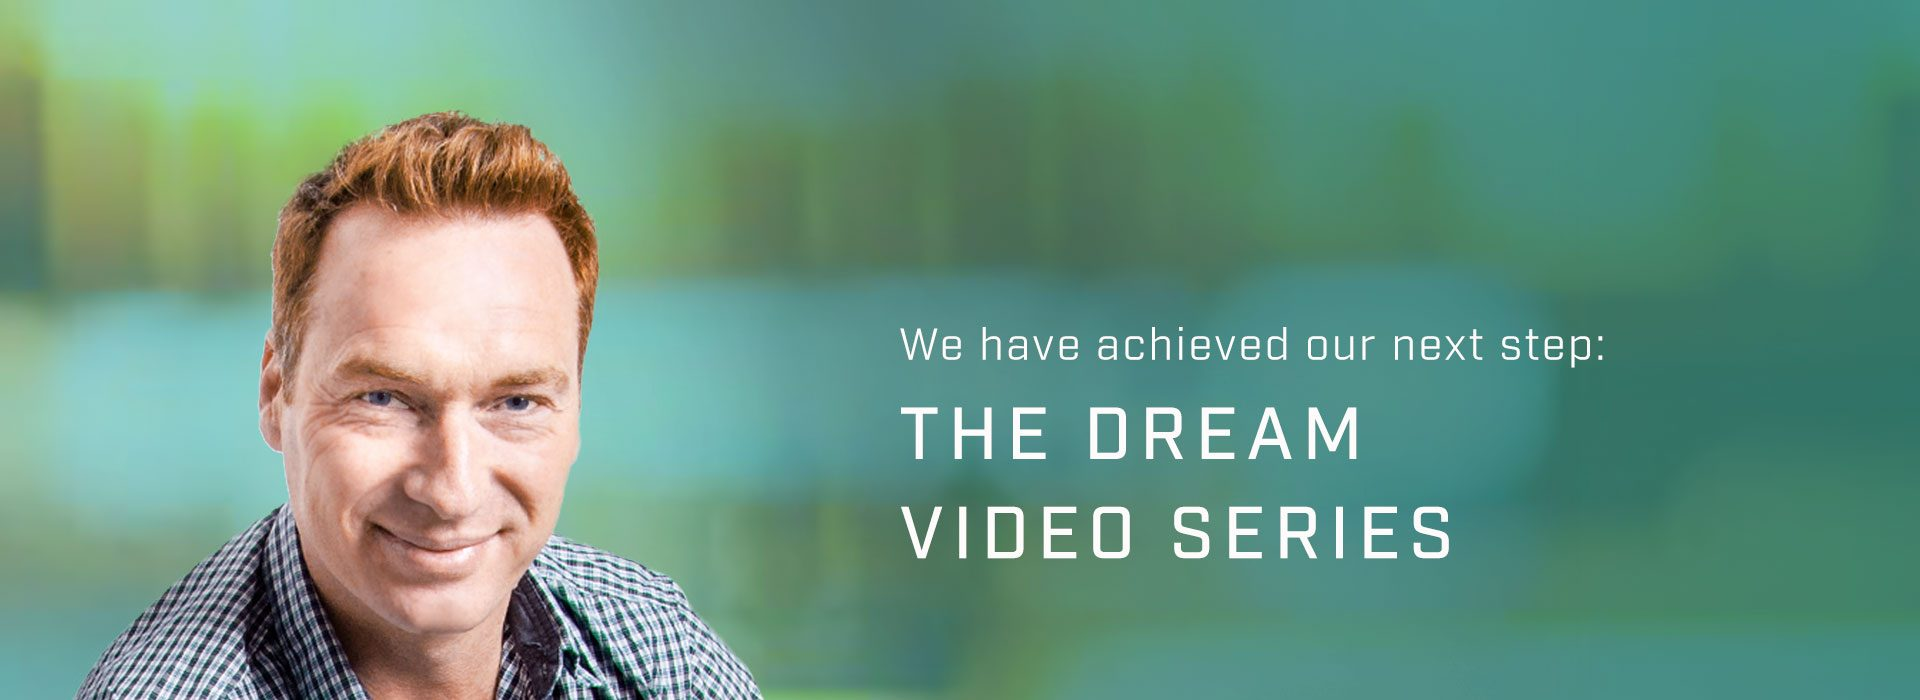 THE DREAM Video Series